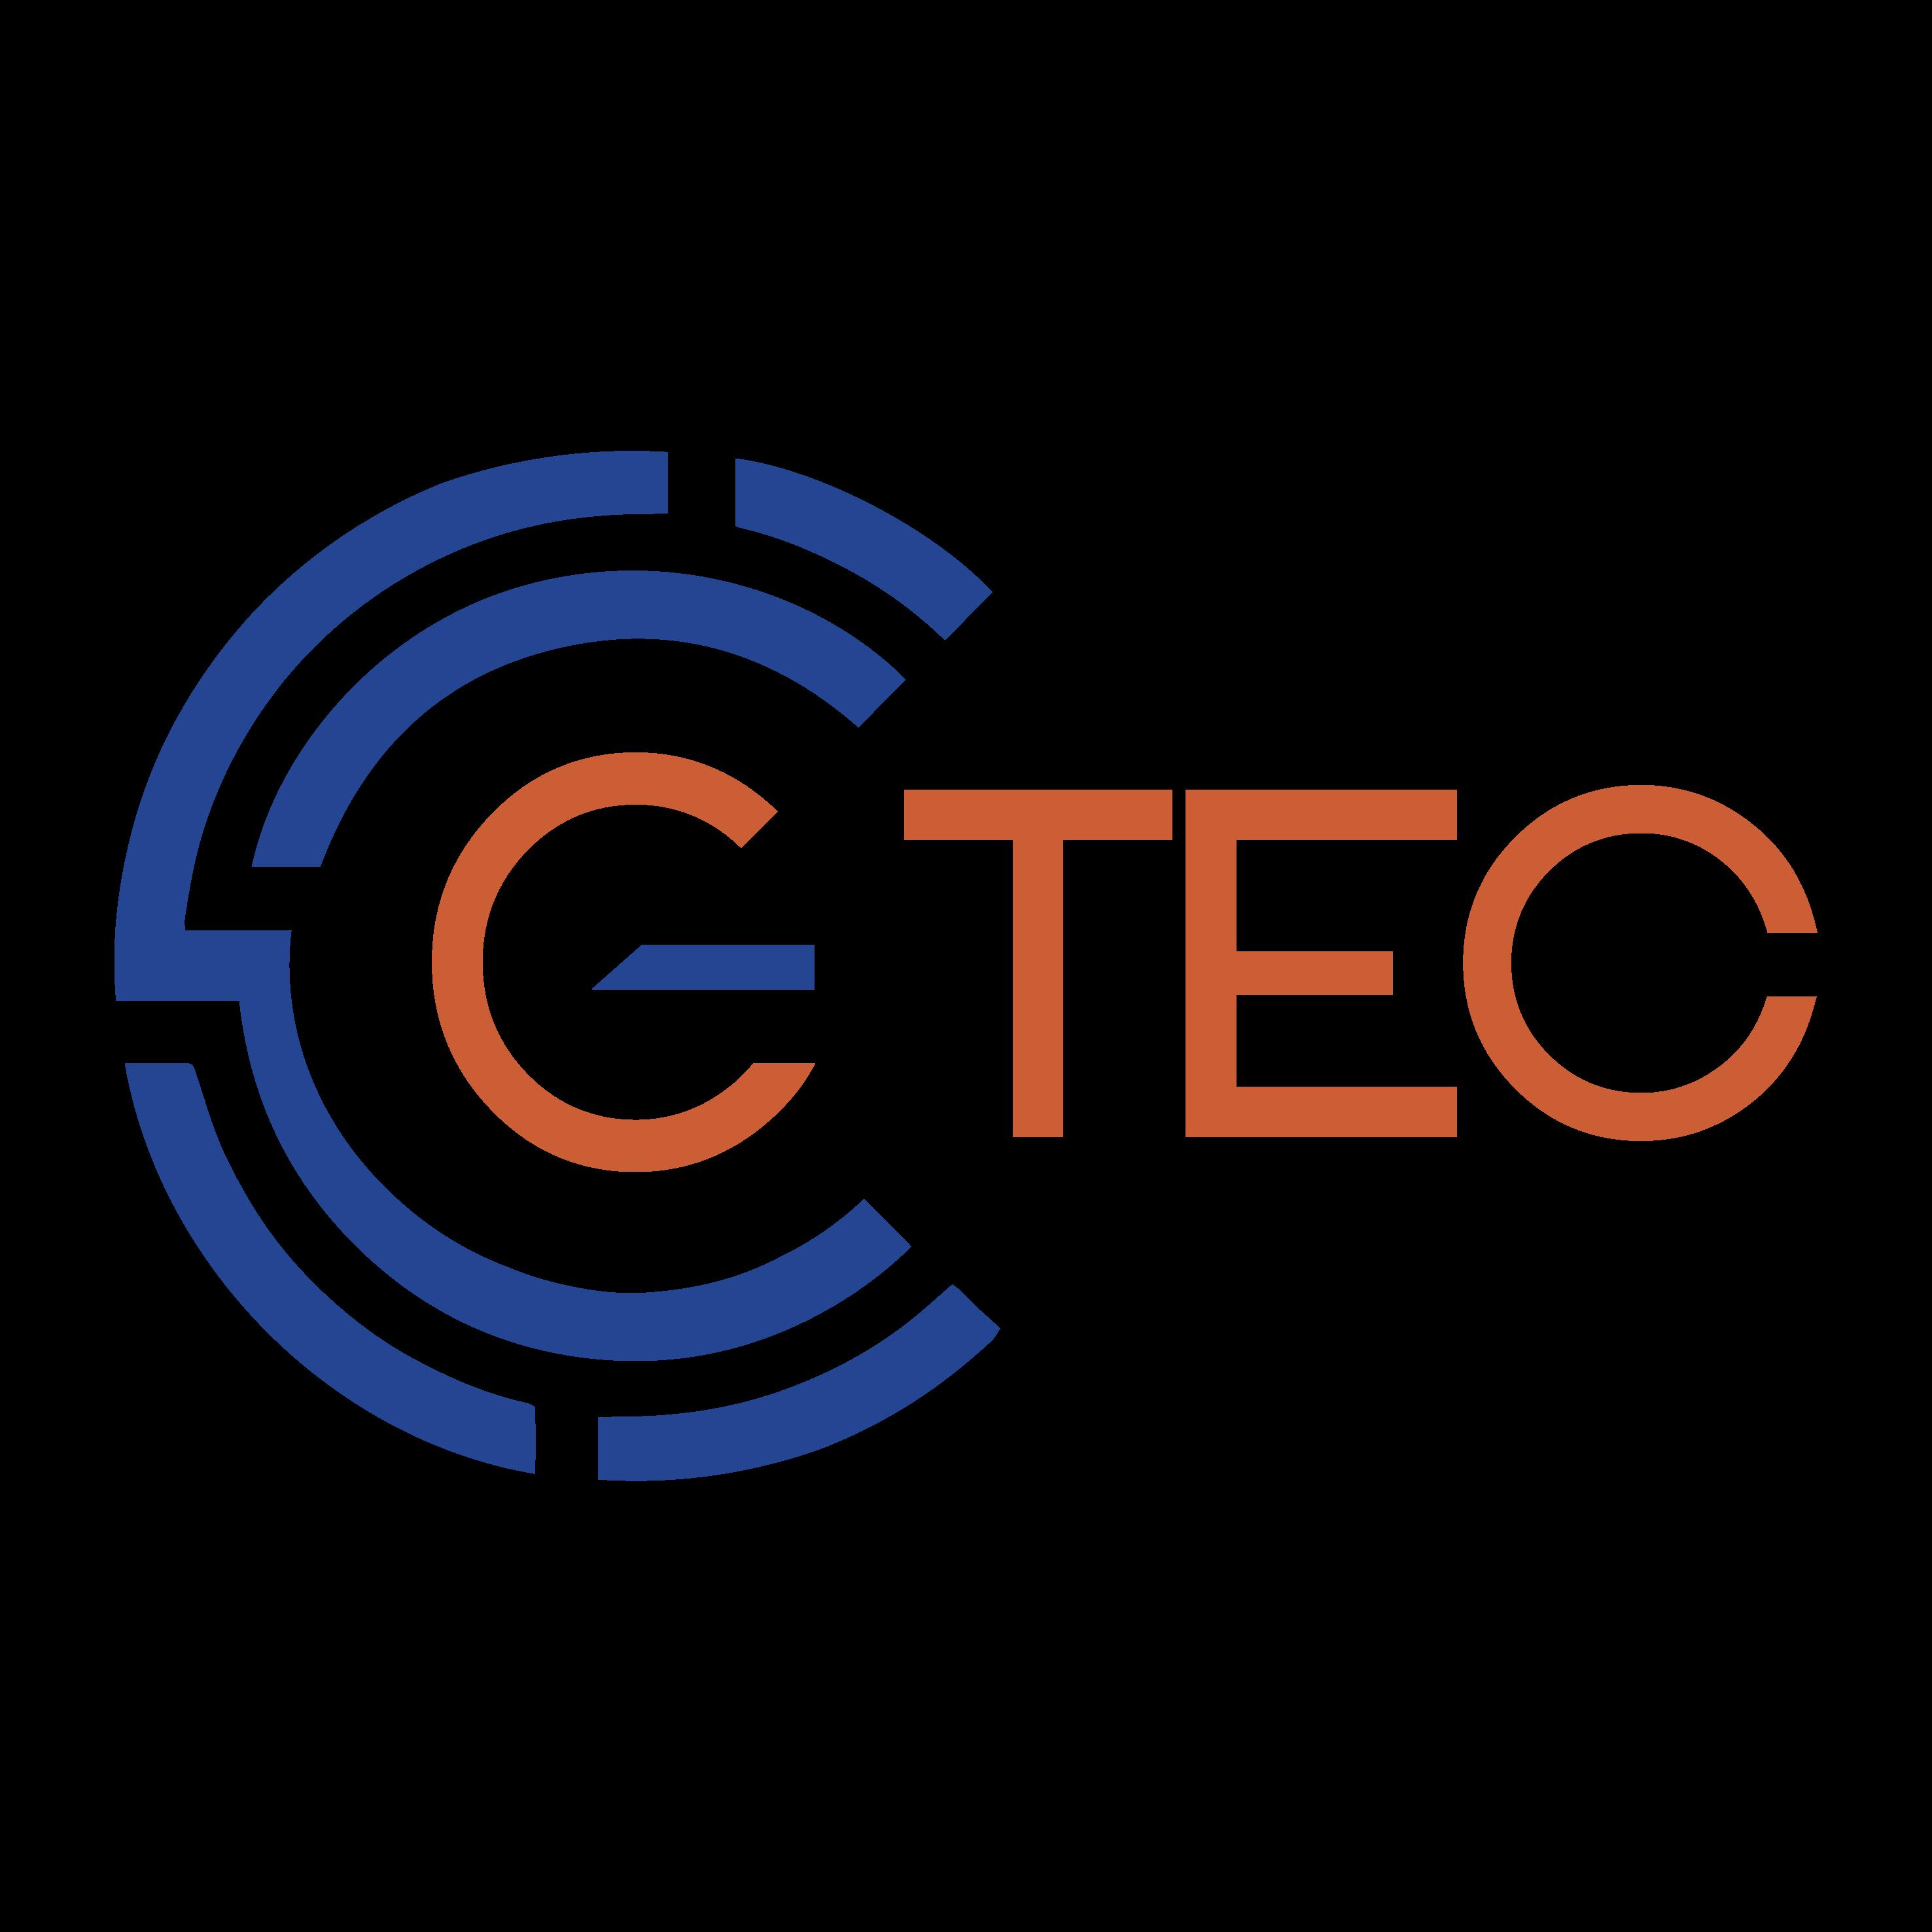 CGTEC